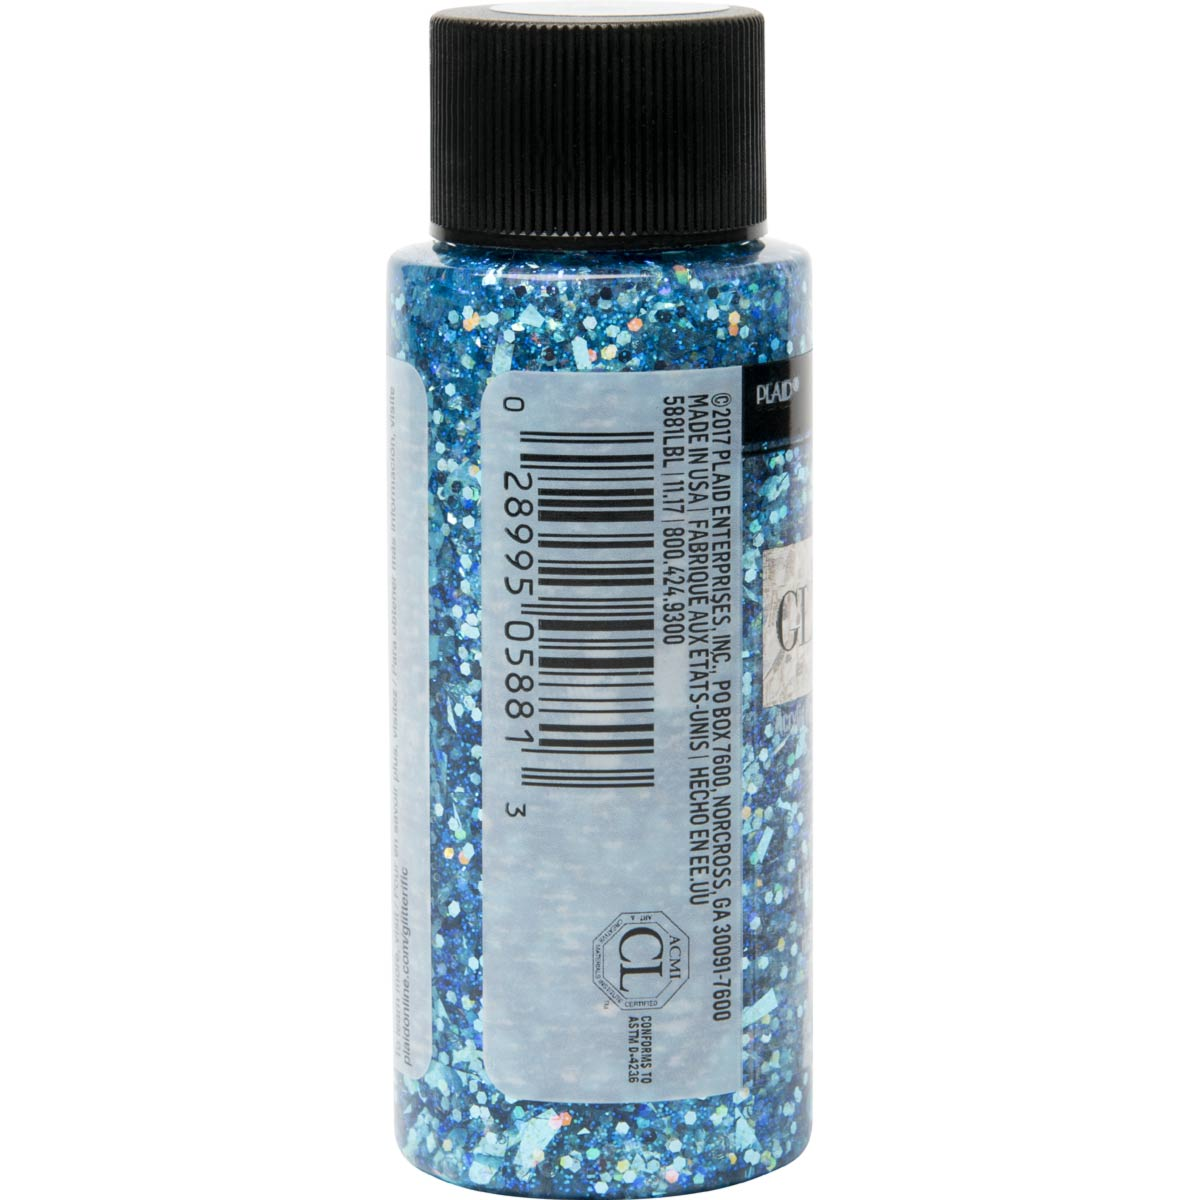 FolkArt ® Glitterific™ Acrylic Paint - Aqua, 2 oz. - 5881